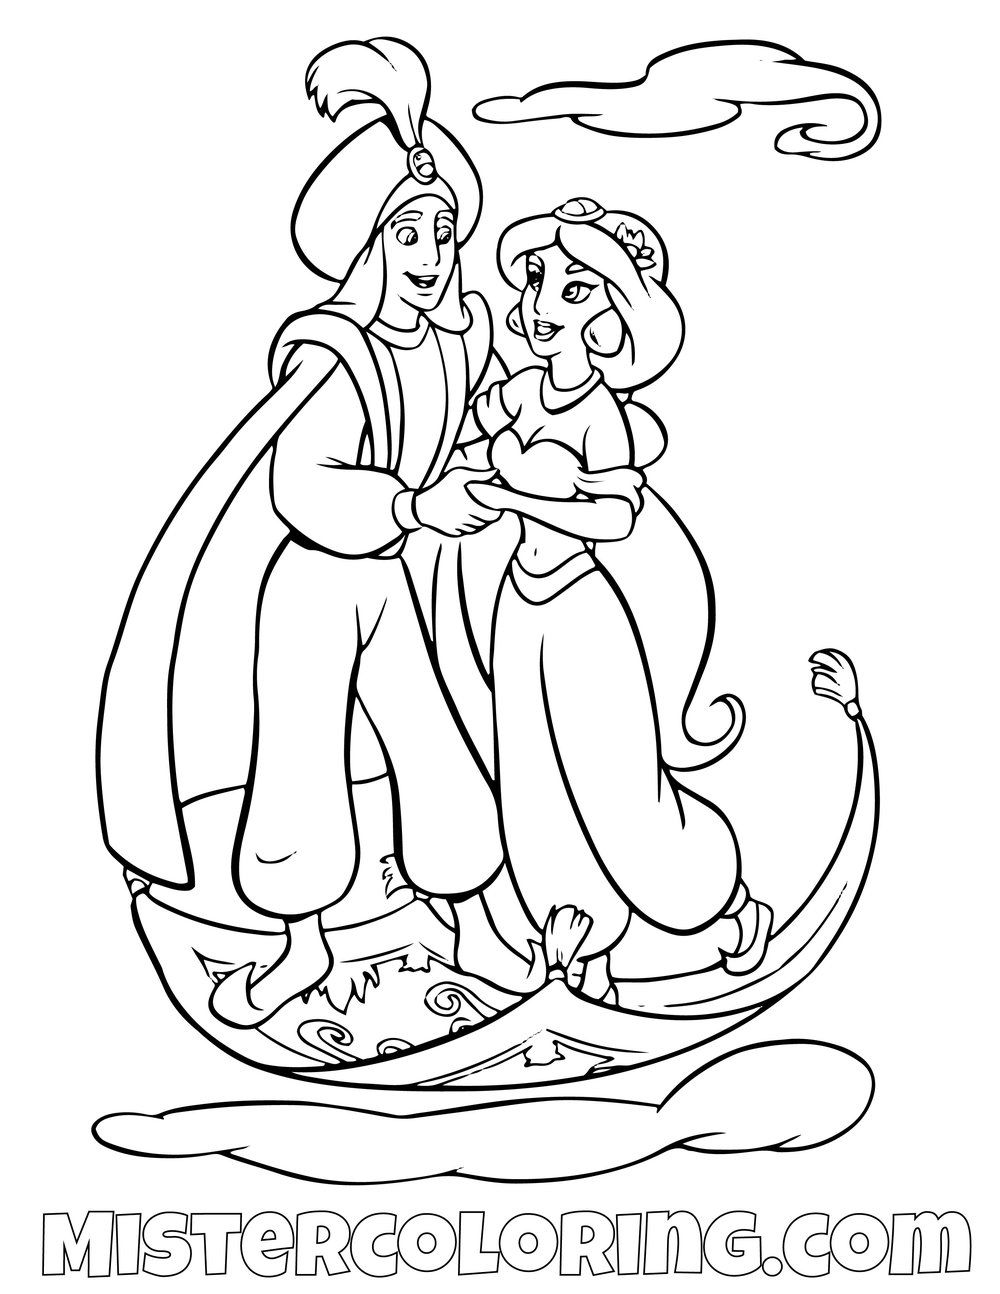 Aladdin And Princess Jasmine Riding Carpet Aladdin Coloring Page